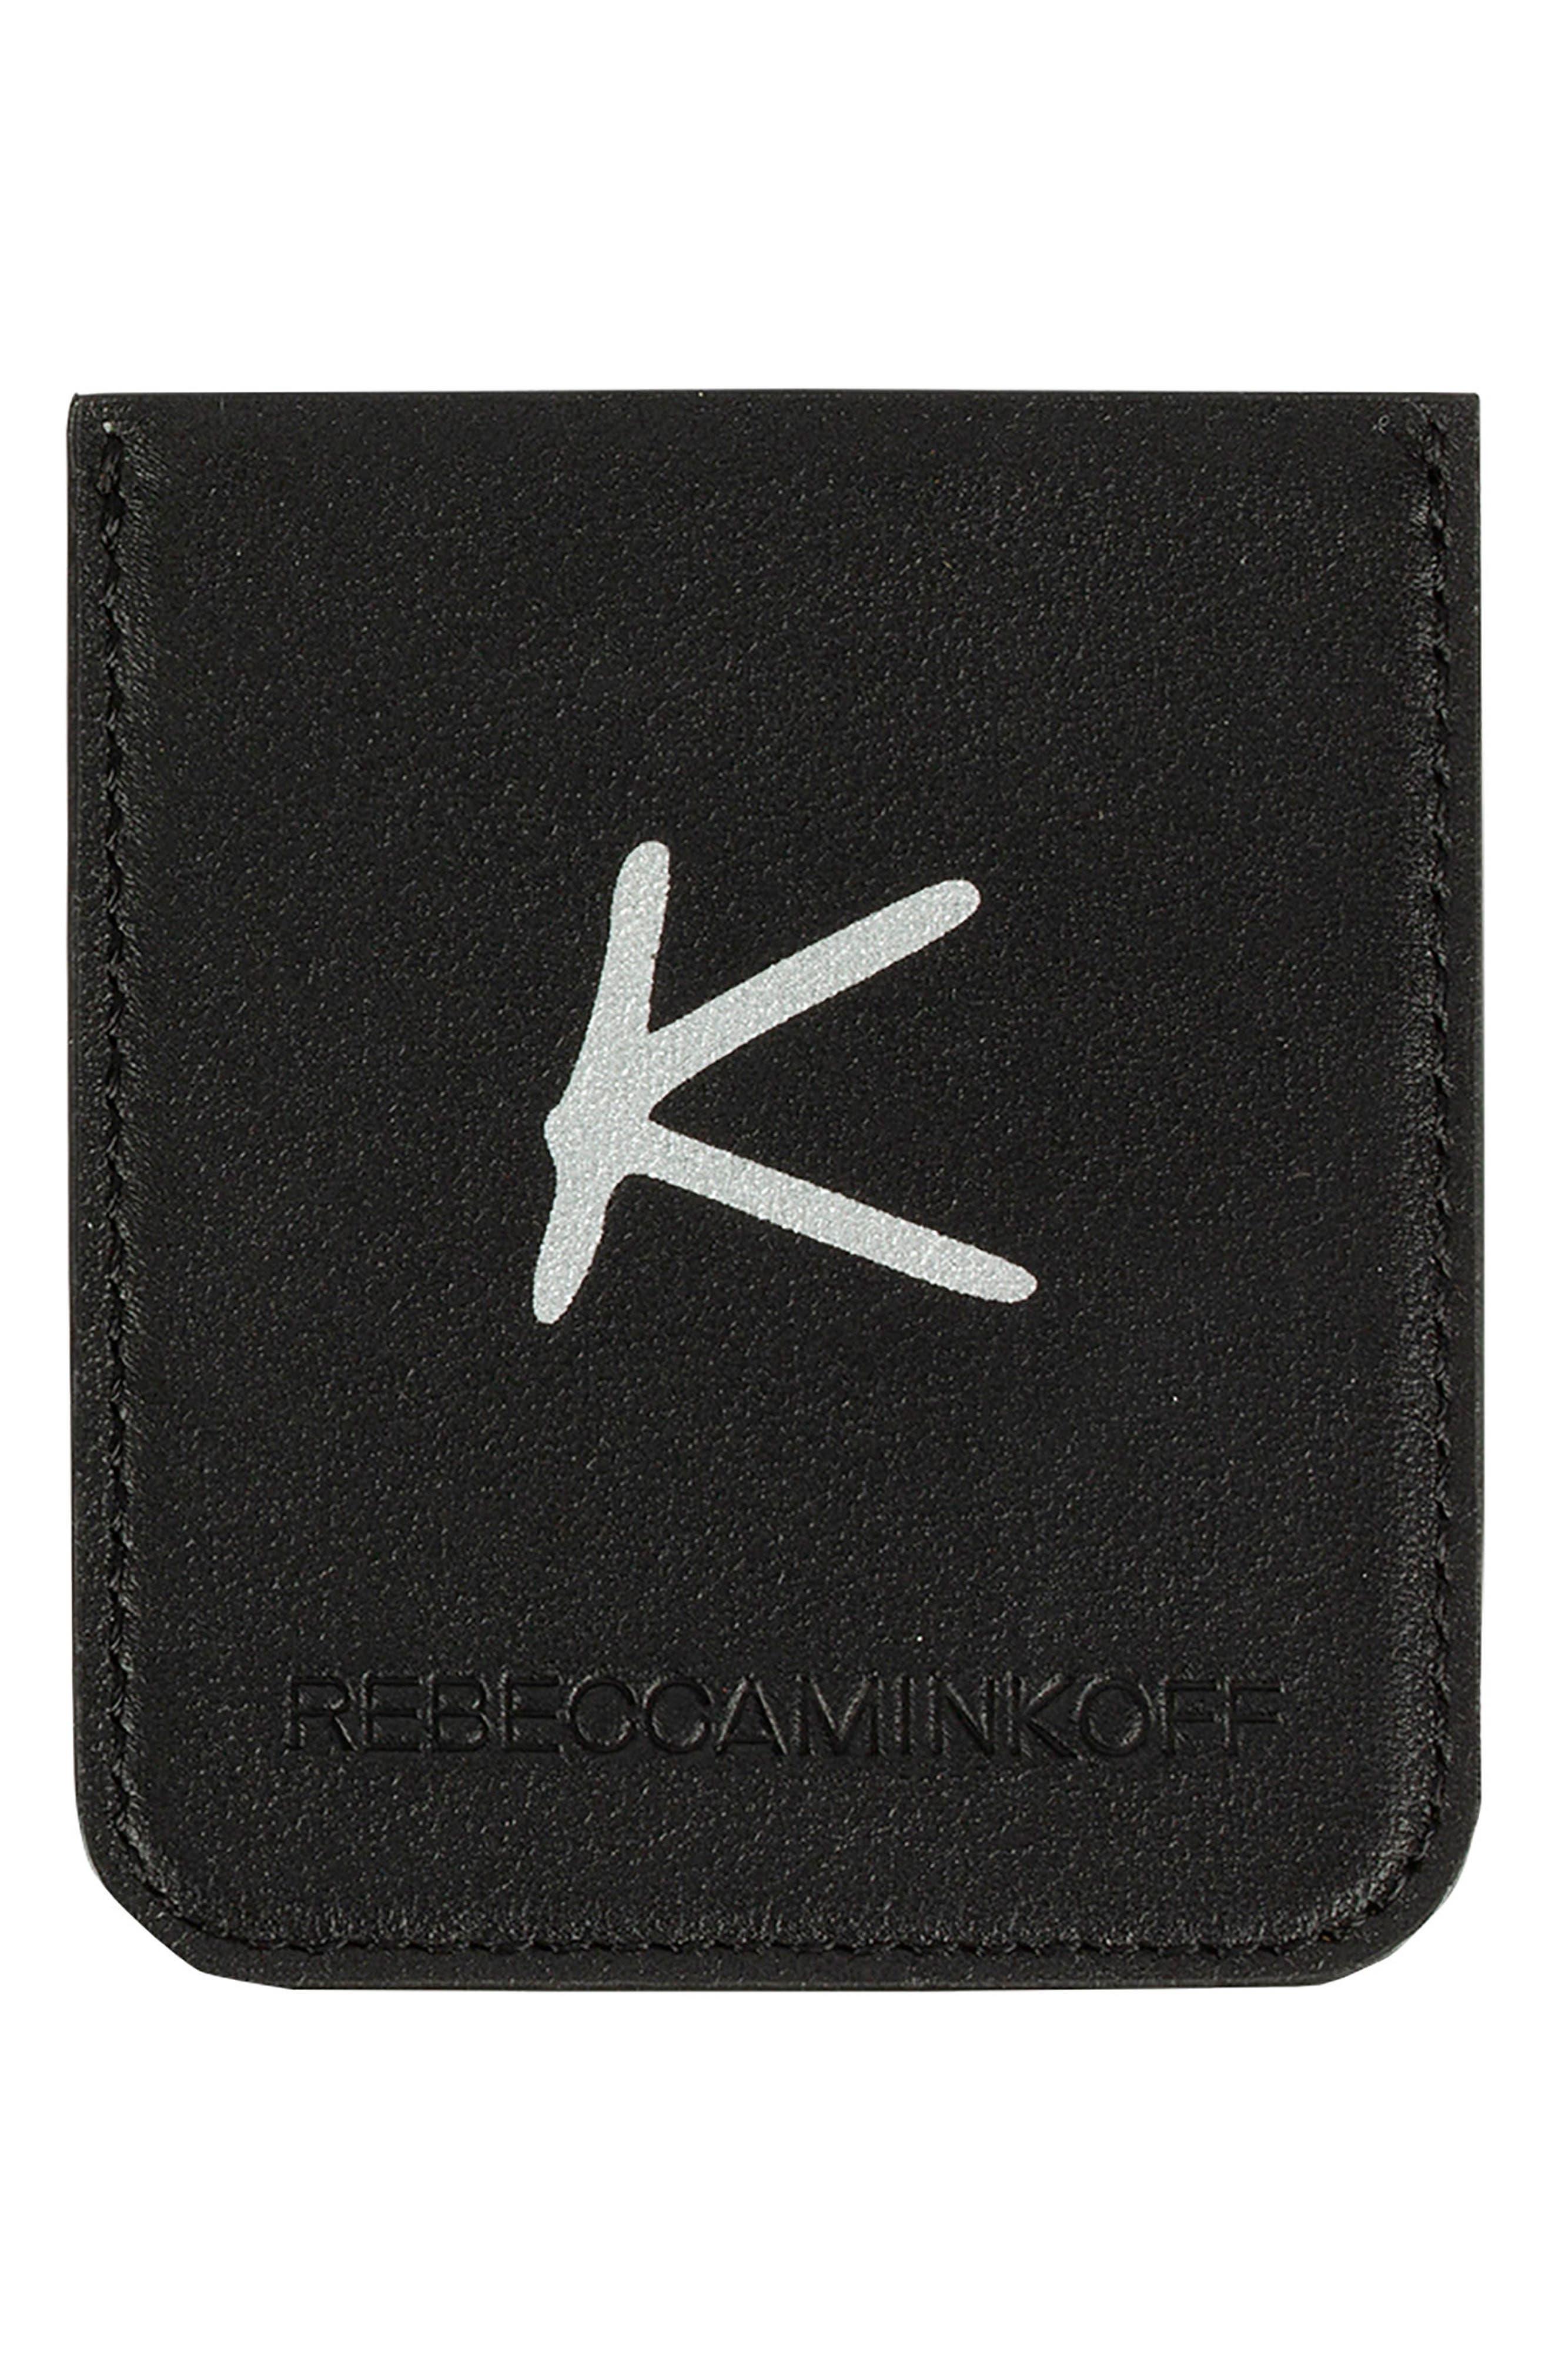 Initial Smartphone Sticker Pocket,                             Main thumbnail 1, color,                             K - Black/ Silver Foil